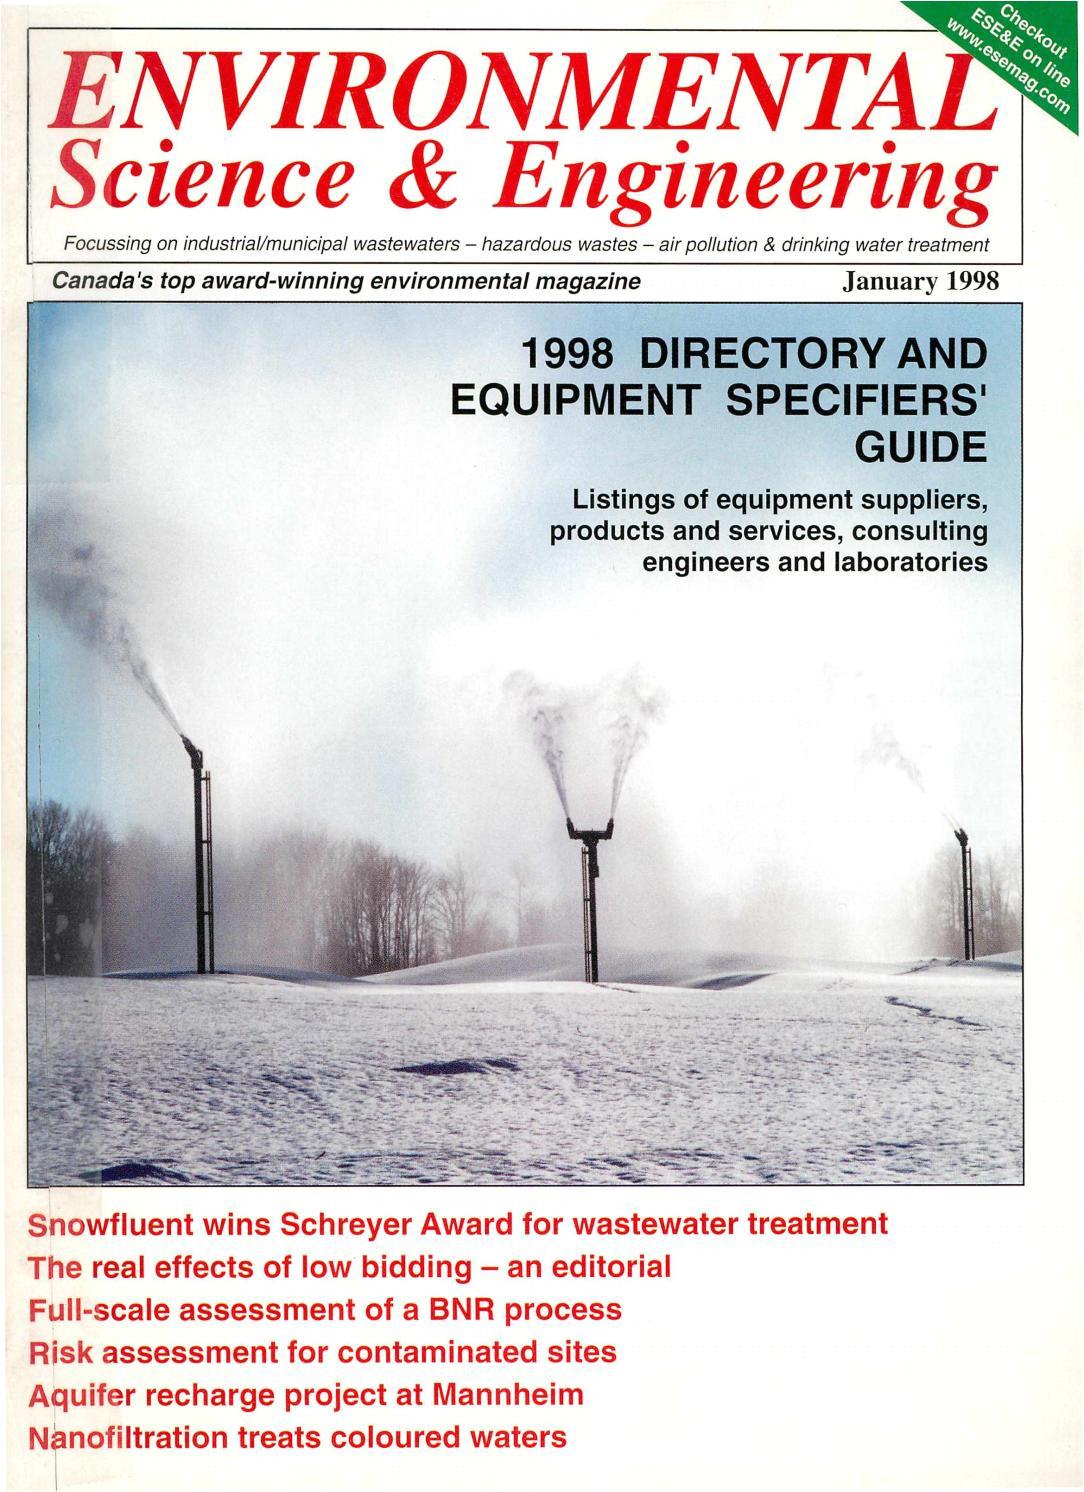 environmental science engineering magazine esemag january 1998 by environmental science and engineering magazine issuu